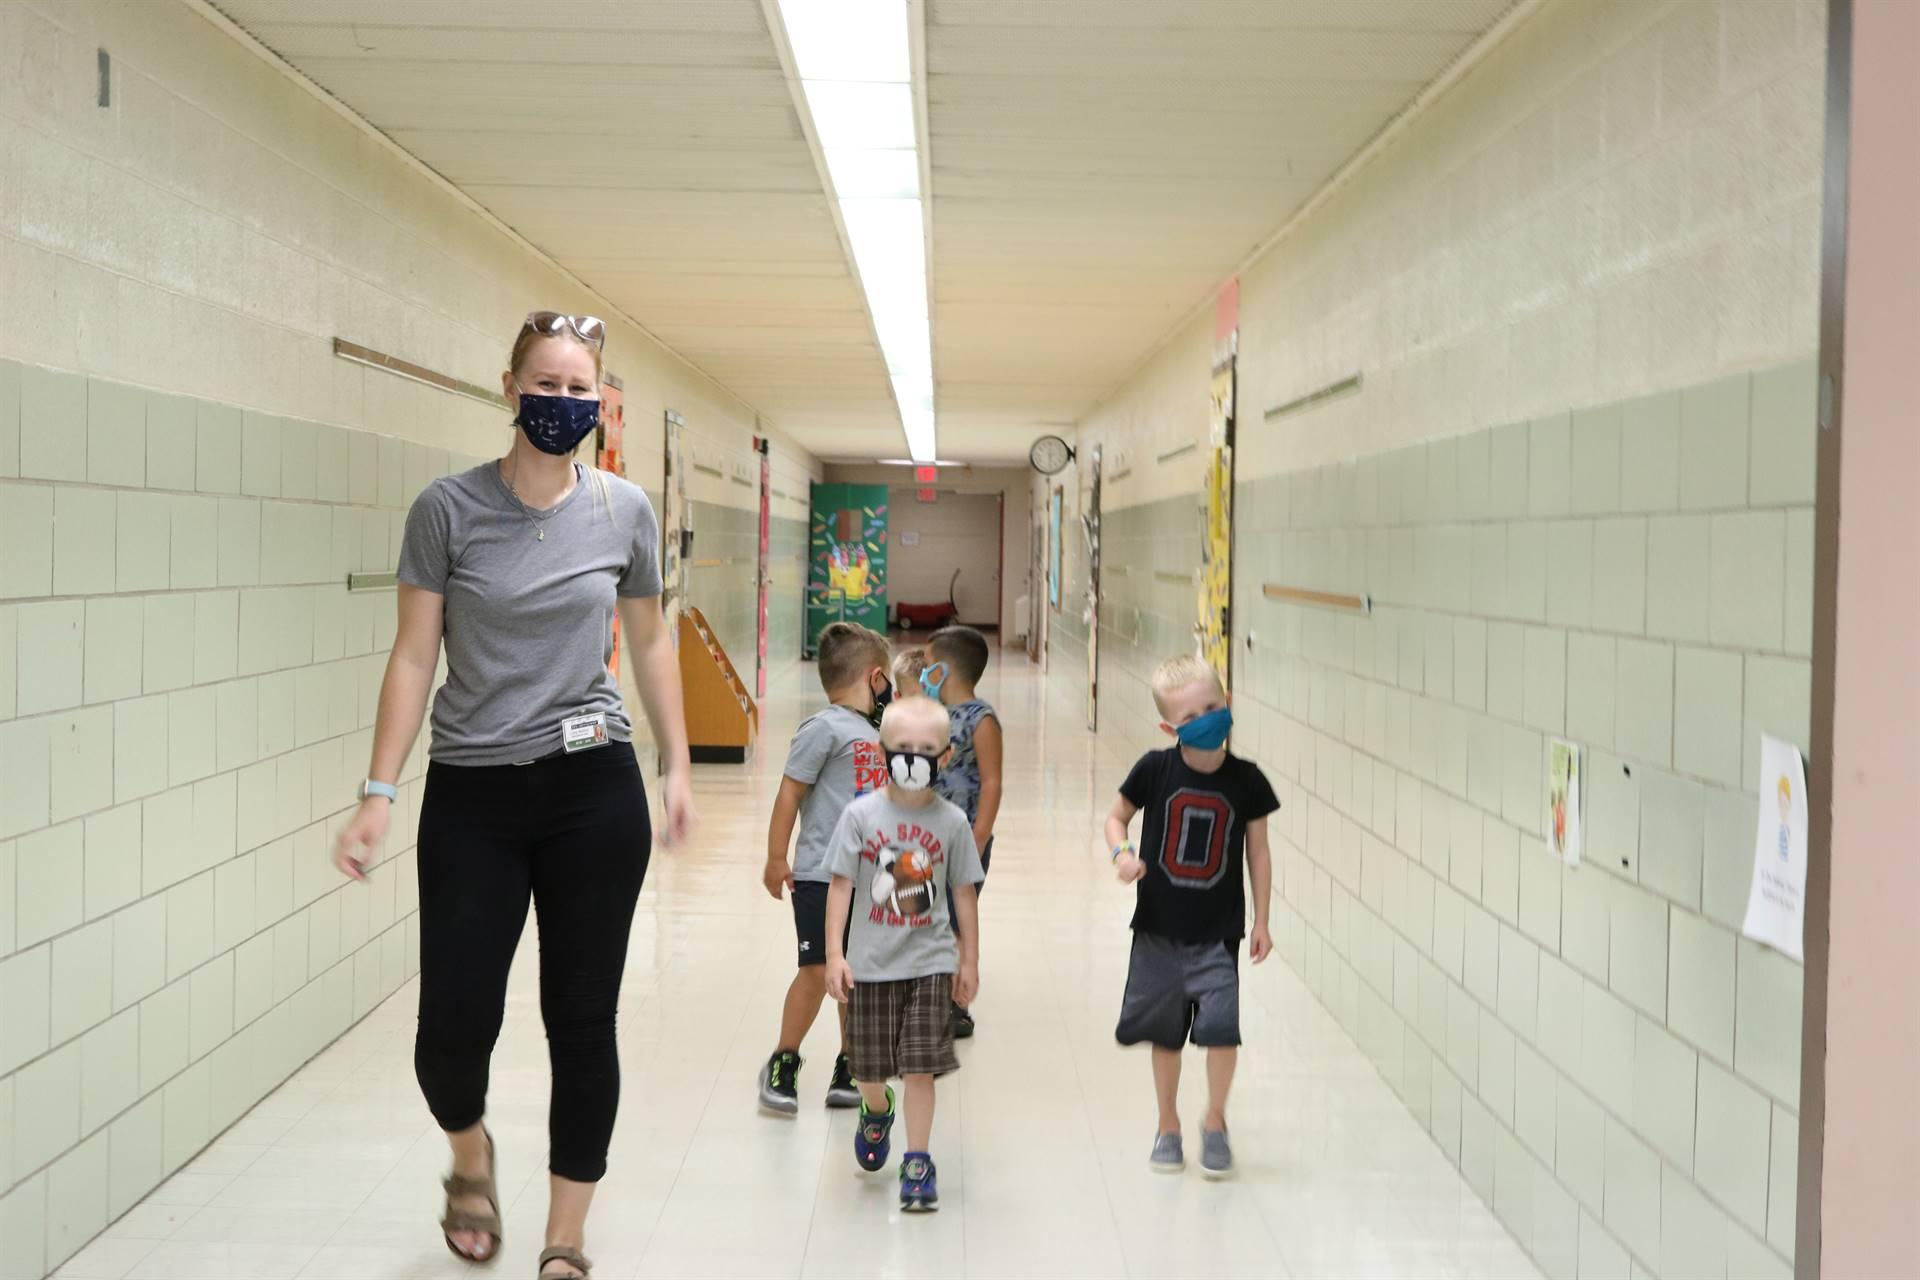 teacher walking in hall with 3 boys